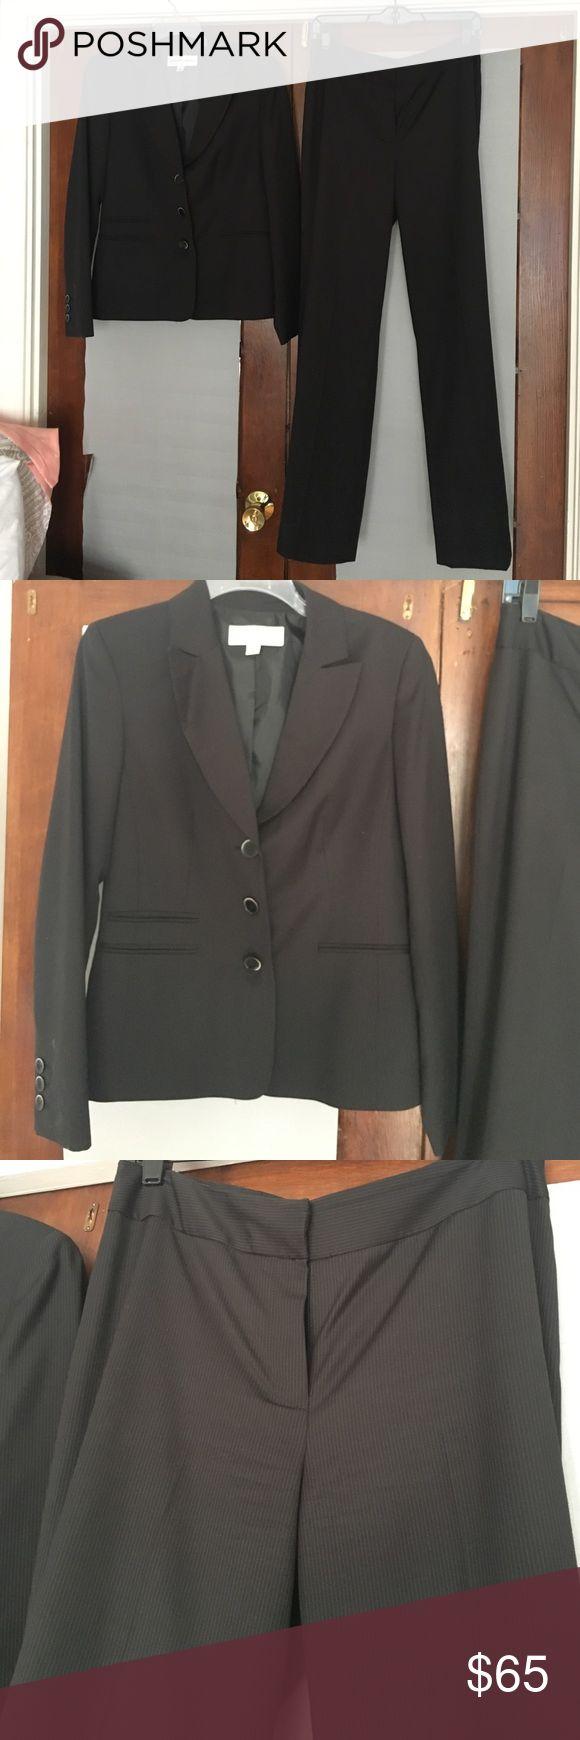 Jones New York Suit - Women's Black pinstripe suit NWOT wore once! Black and grey pinstripe suit. Jones of New York women's size 8. 3 button blazer with flat front pants. Jones New York Jackets & Coats Blazers